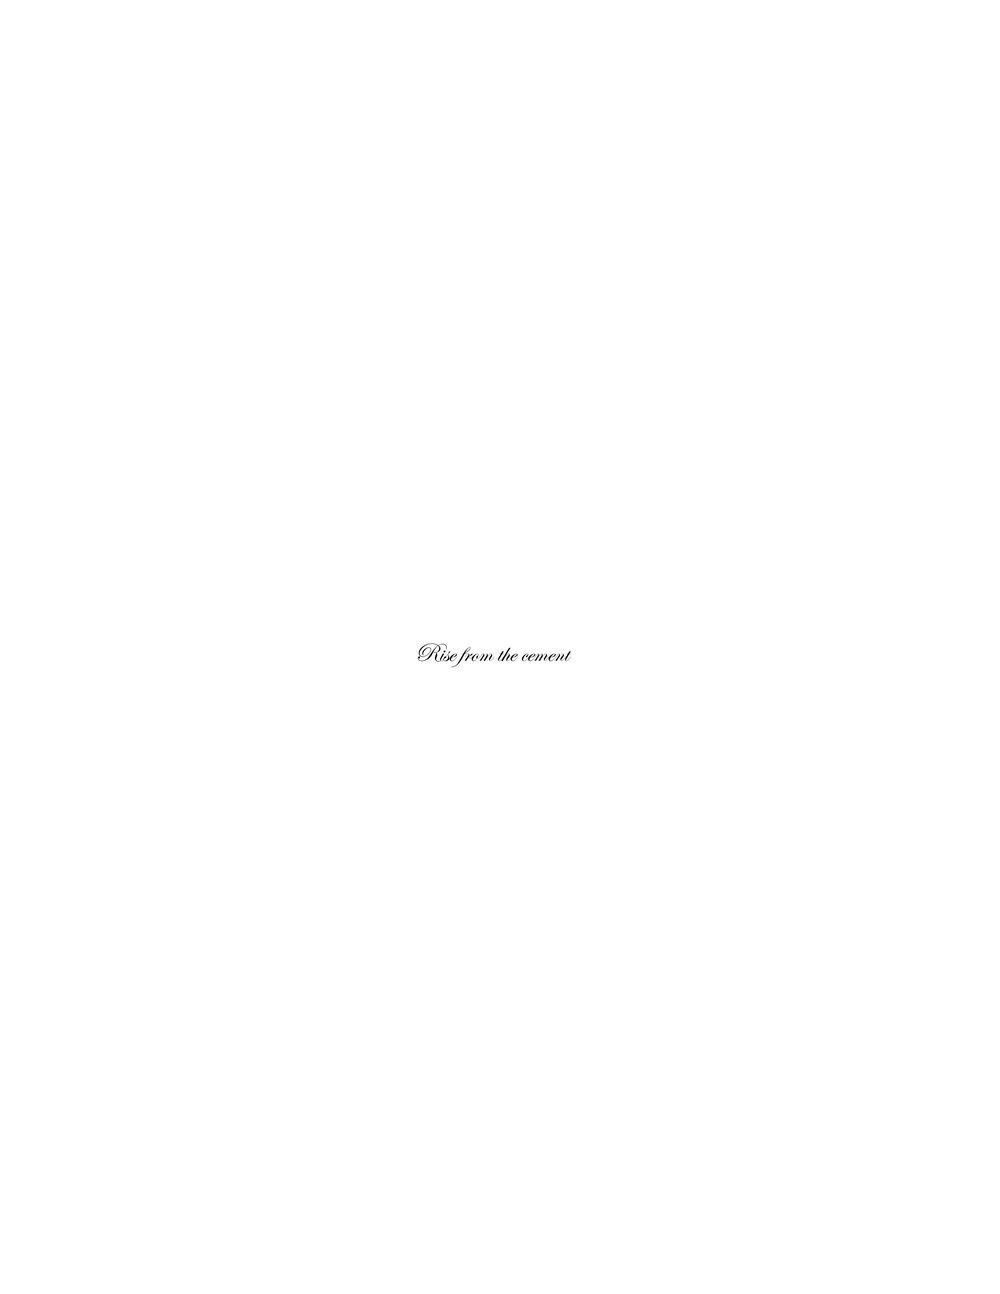 SLFH_vol_1-page-002.jpg